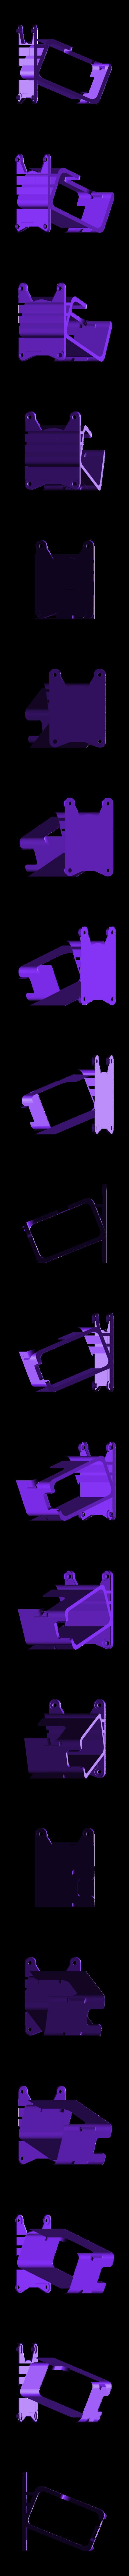 hero5-6-22-degrees.stl Download free STL file Martian II - GoPro HERO 5 / 6 Mount - 22° • 3D printer object, Gophy